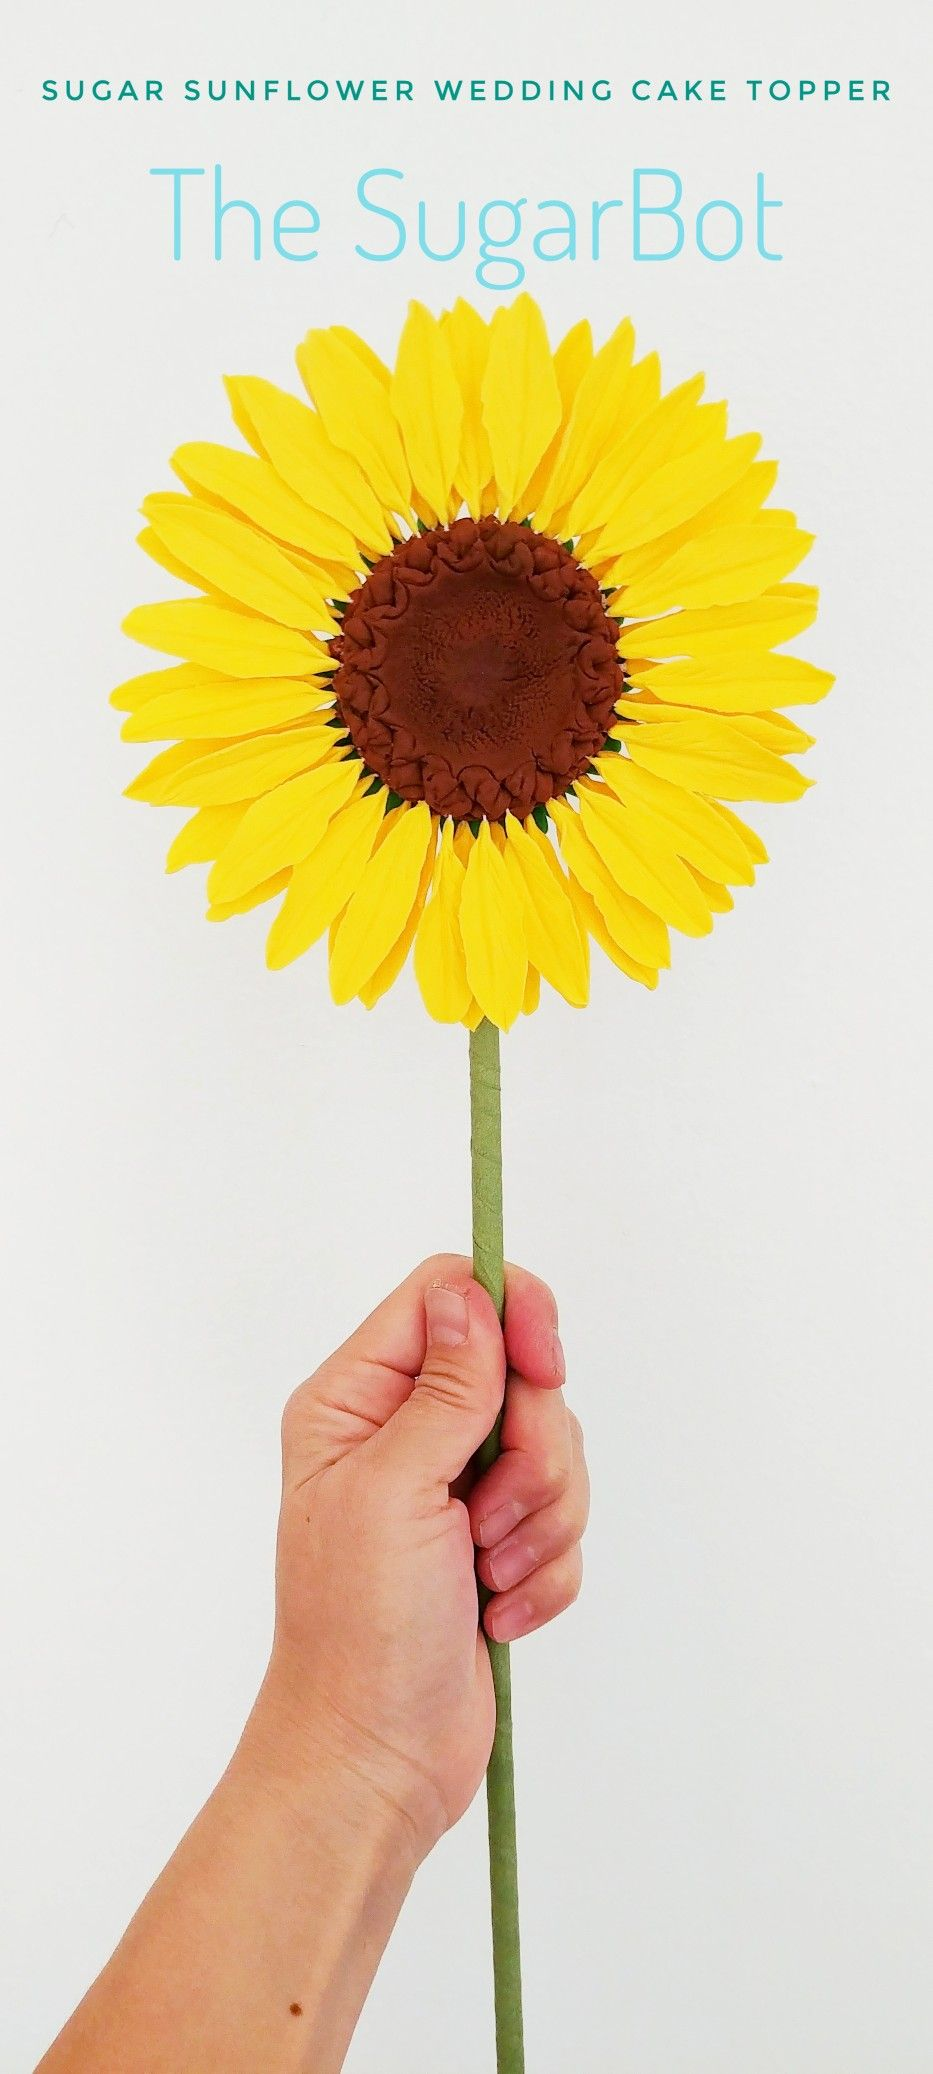 Perfect for a summer wedding custom sugar sunflower